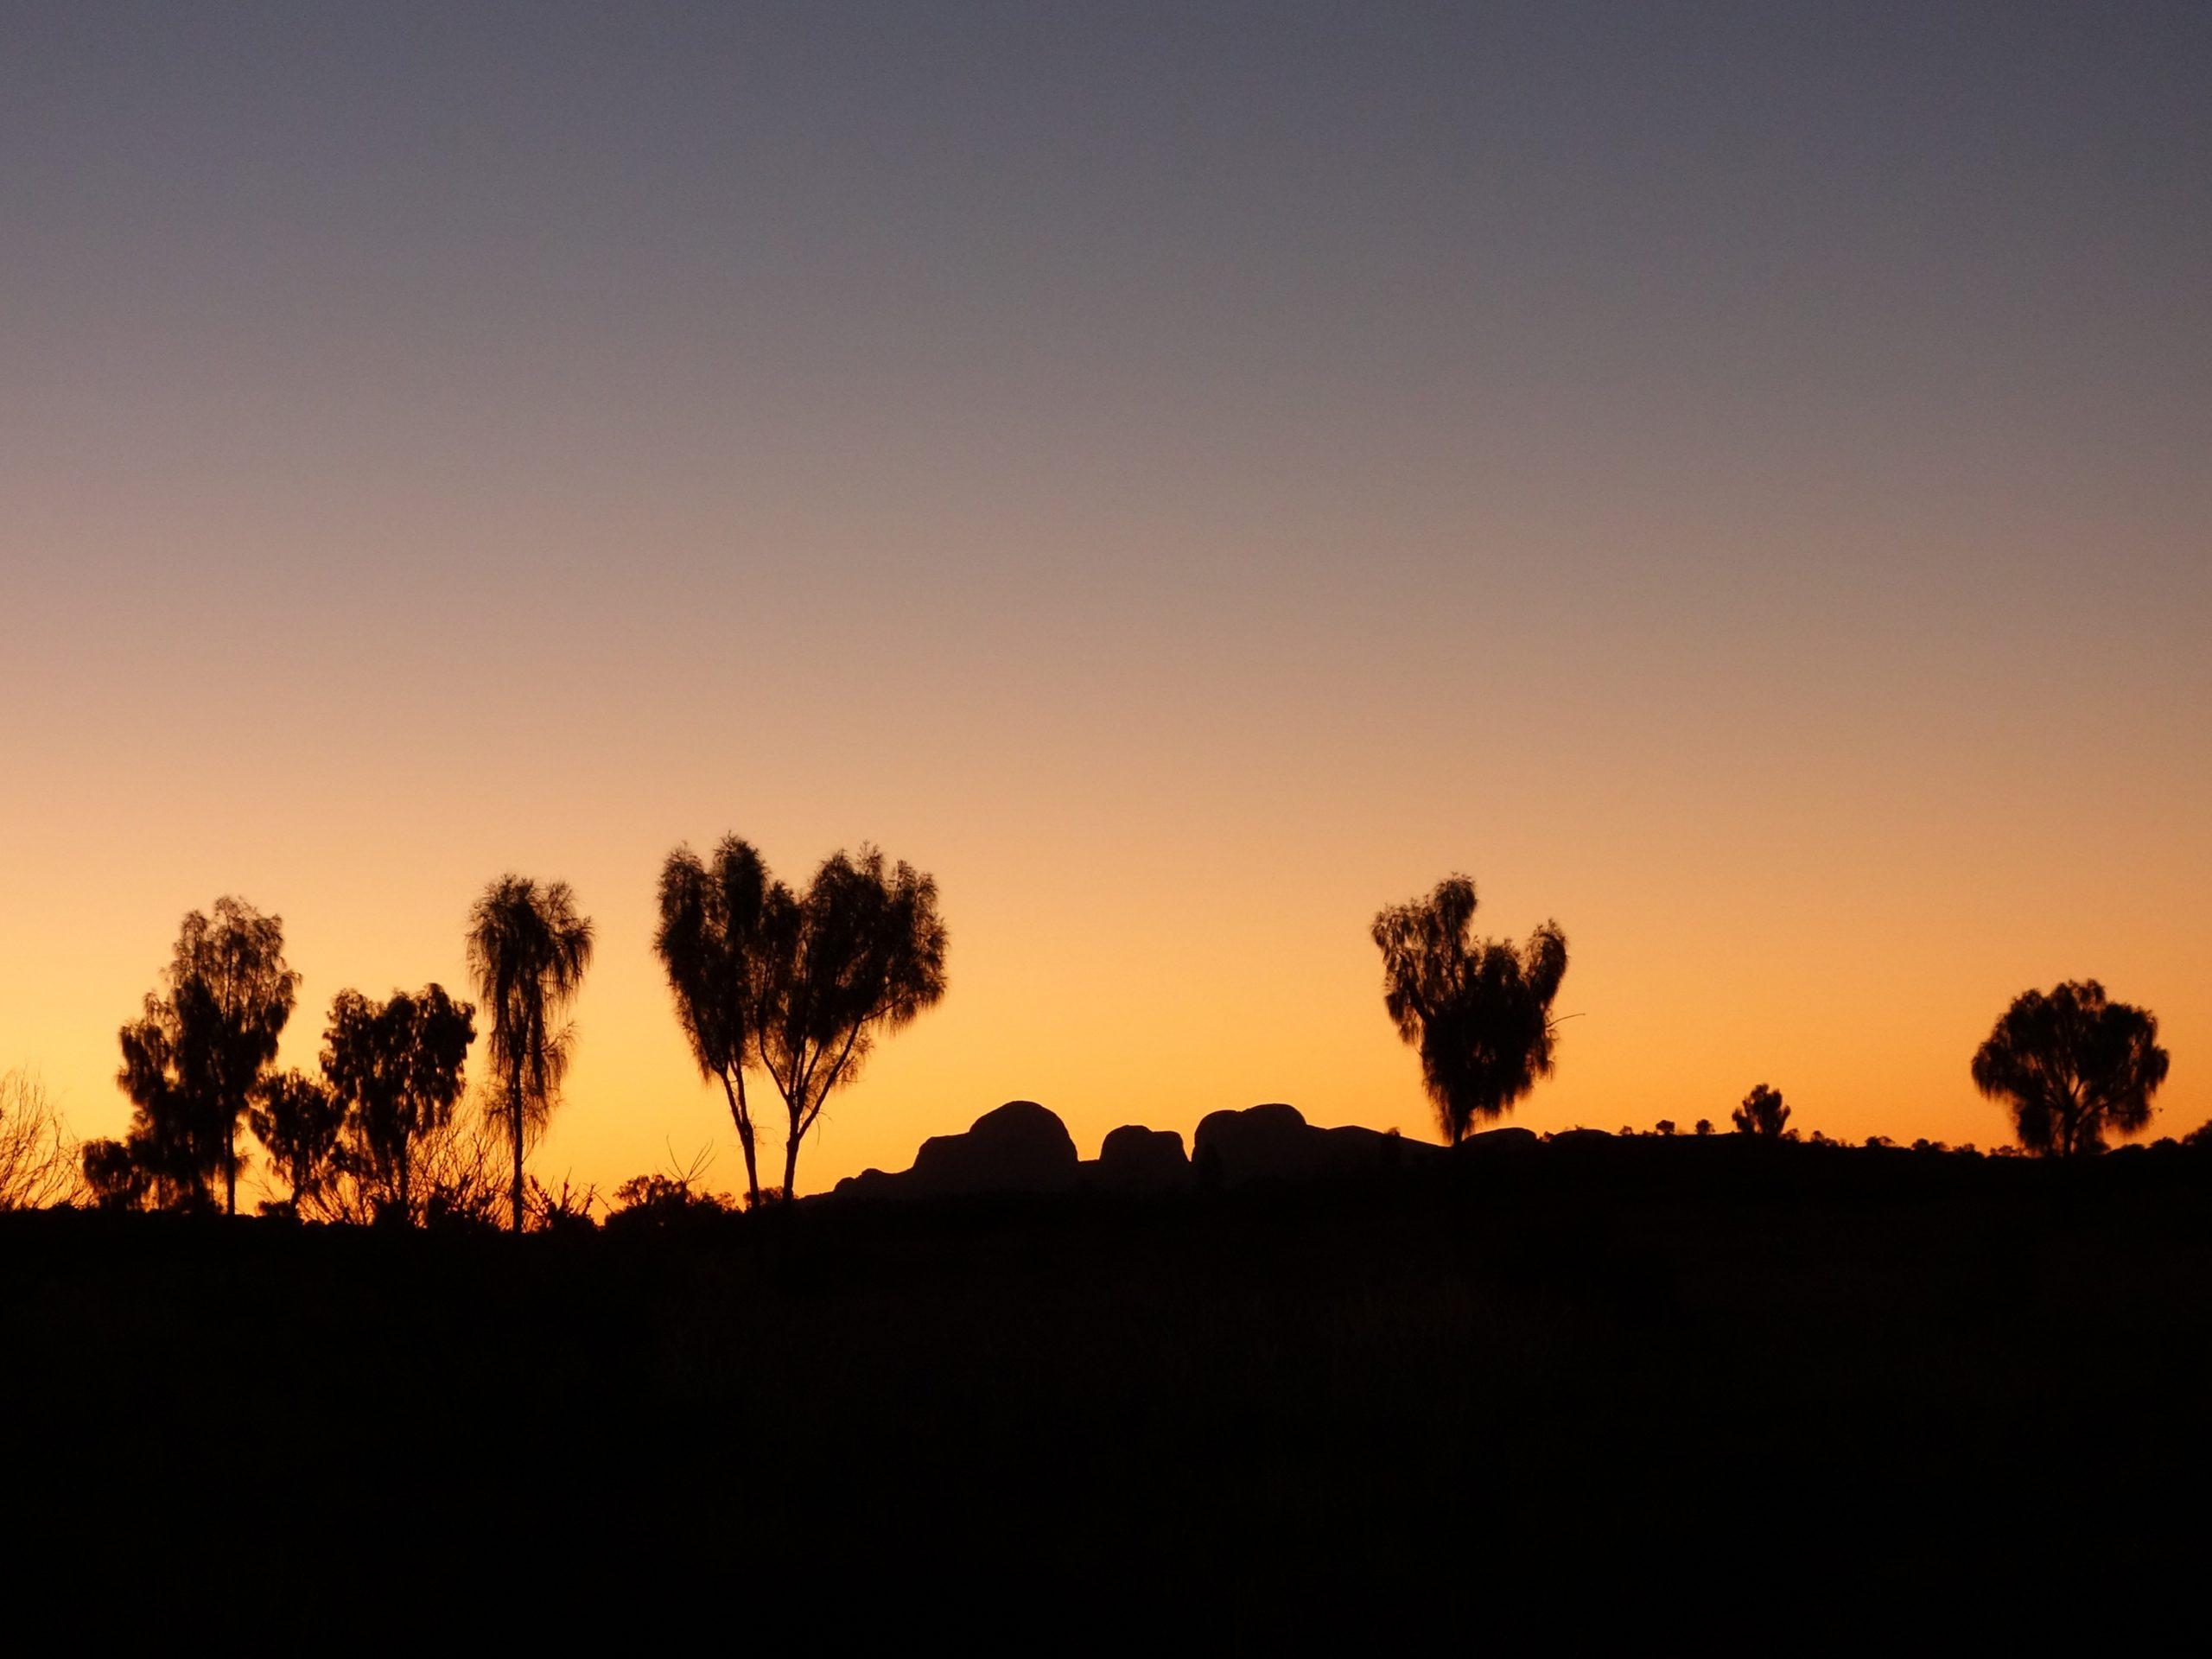 Radreise Australien 2016 - Kata Tjuta - Sonnenuntergang